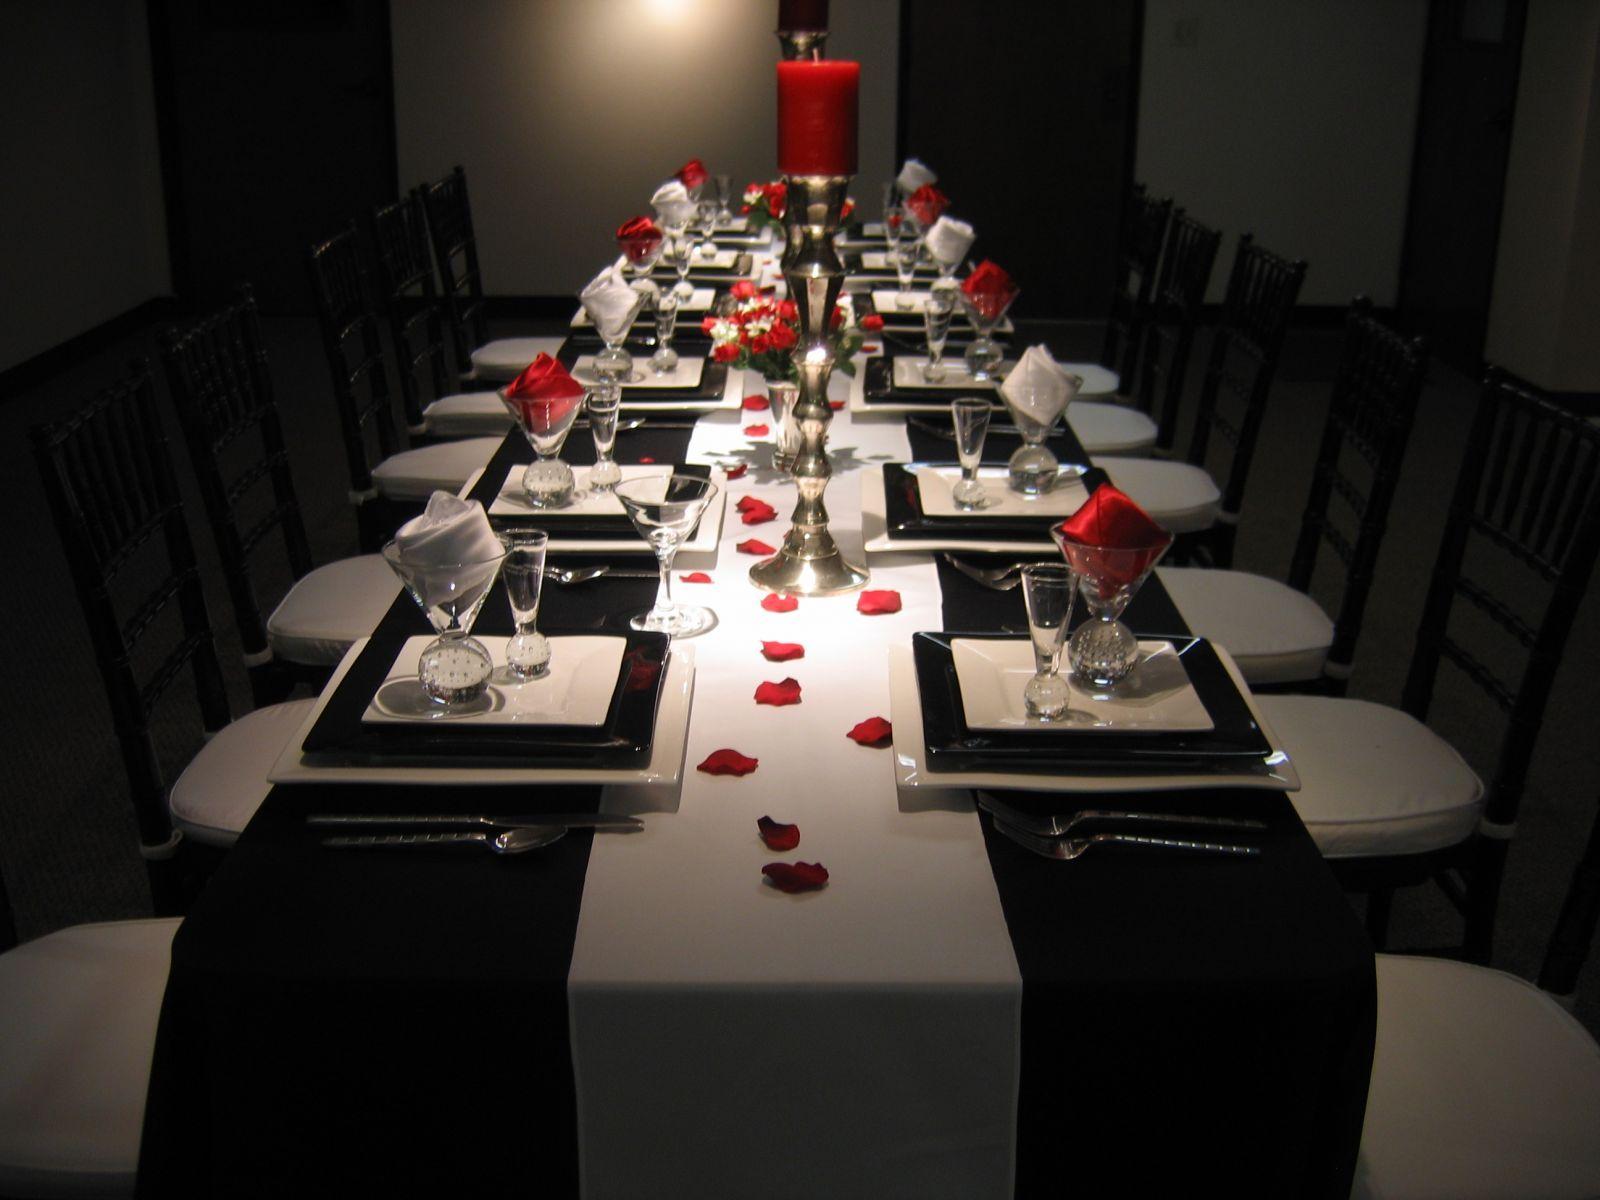 Design Black And White Table Settings elegant black and white table settings dance floor that